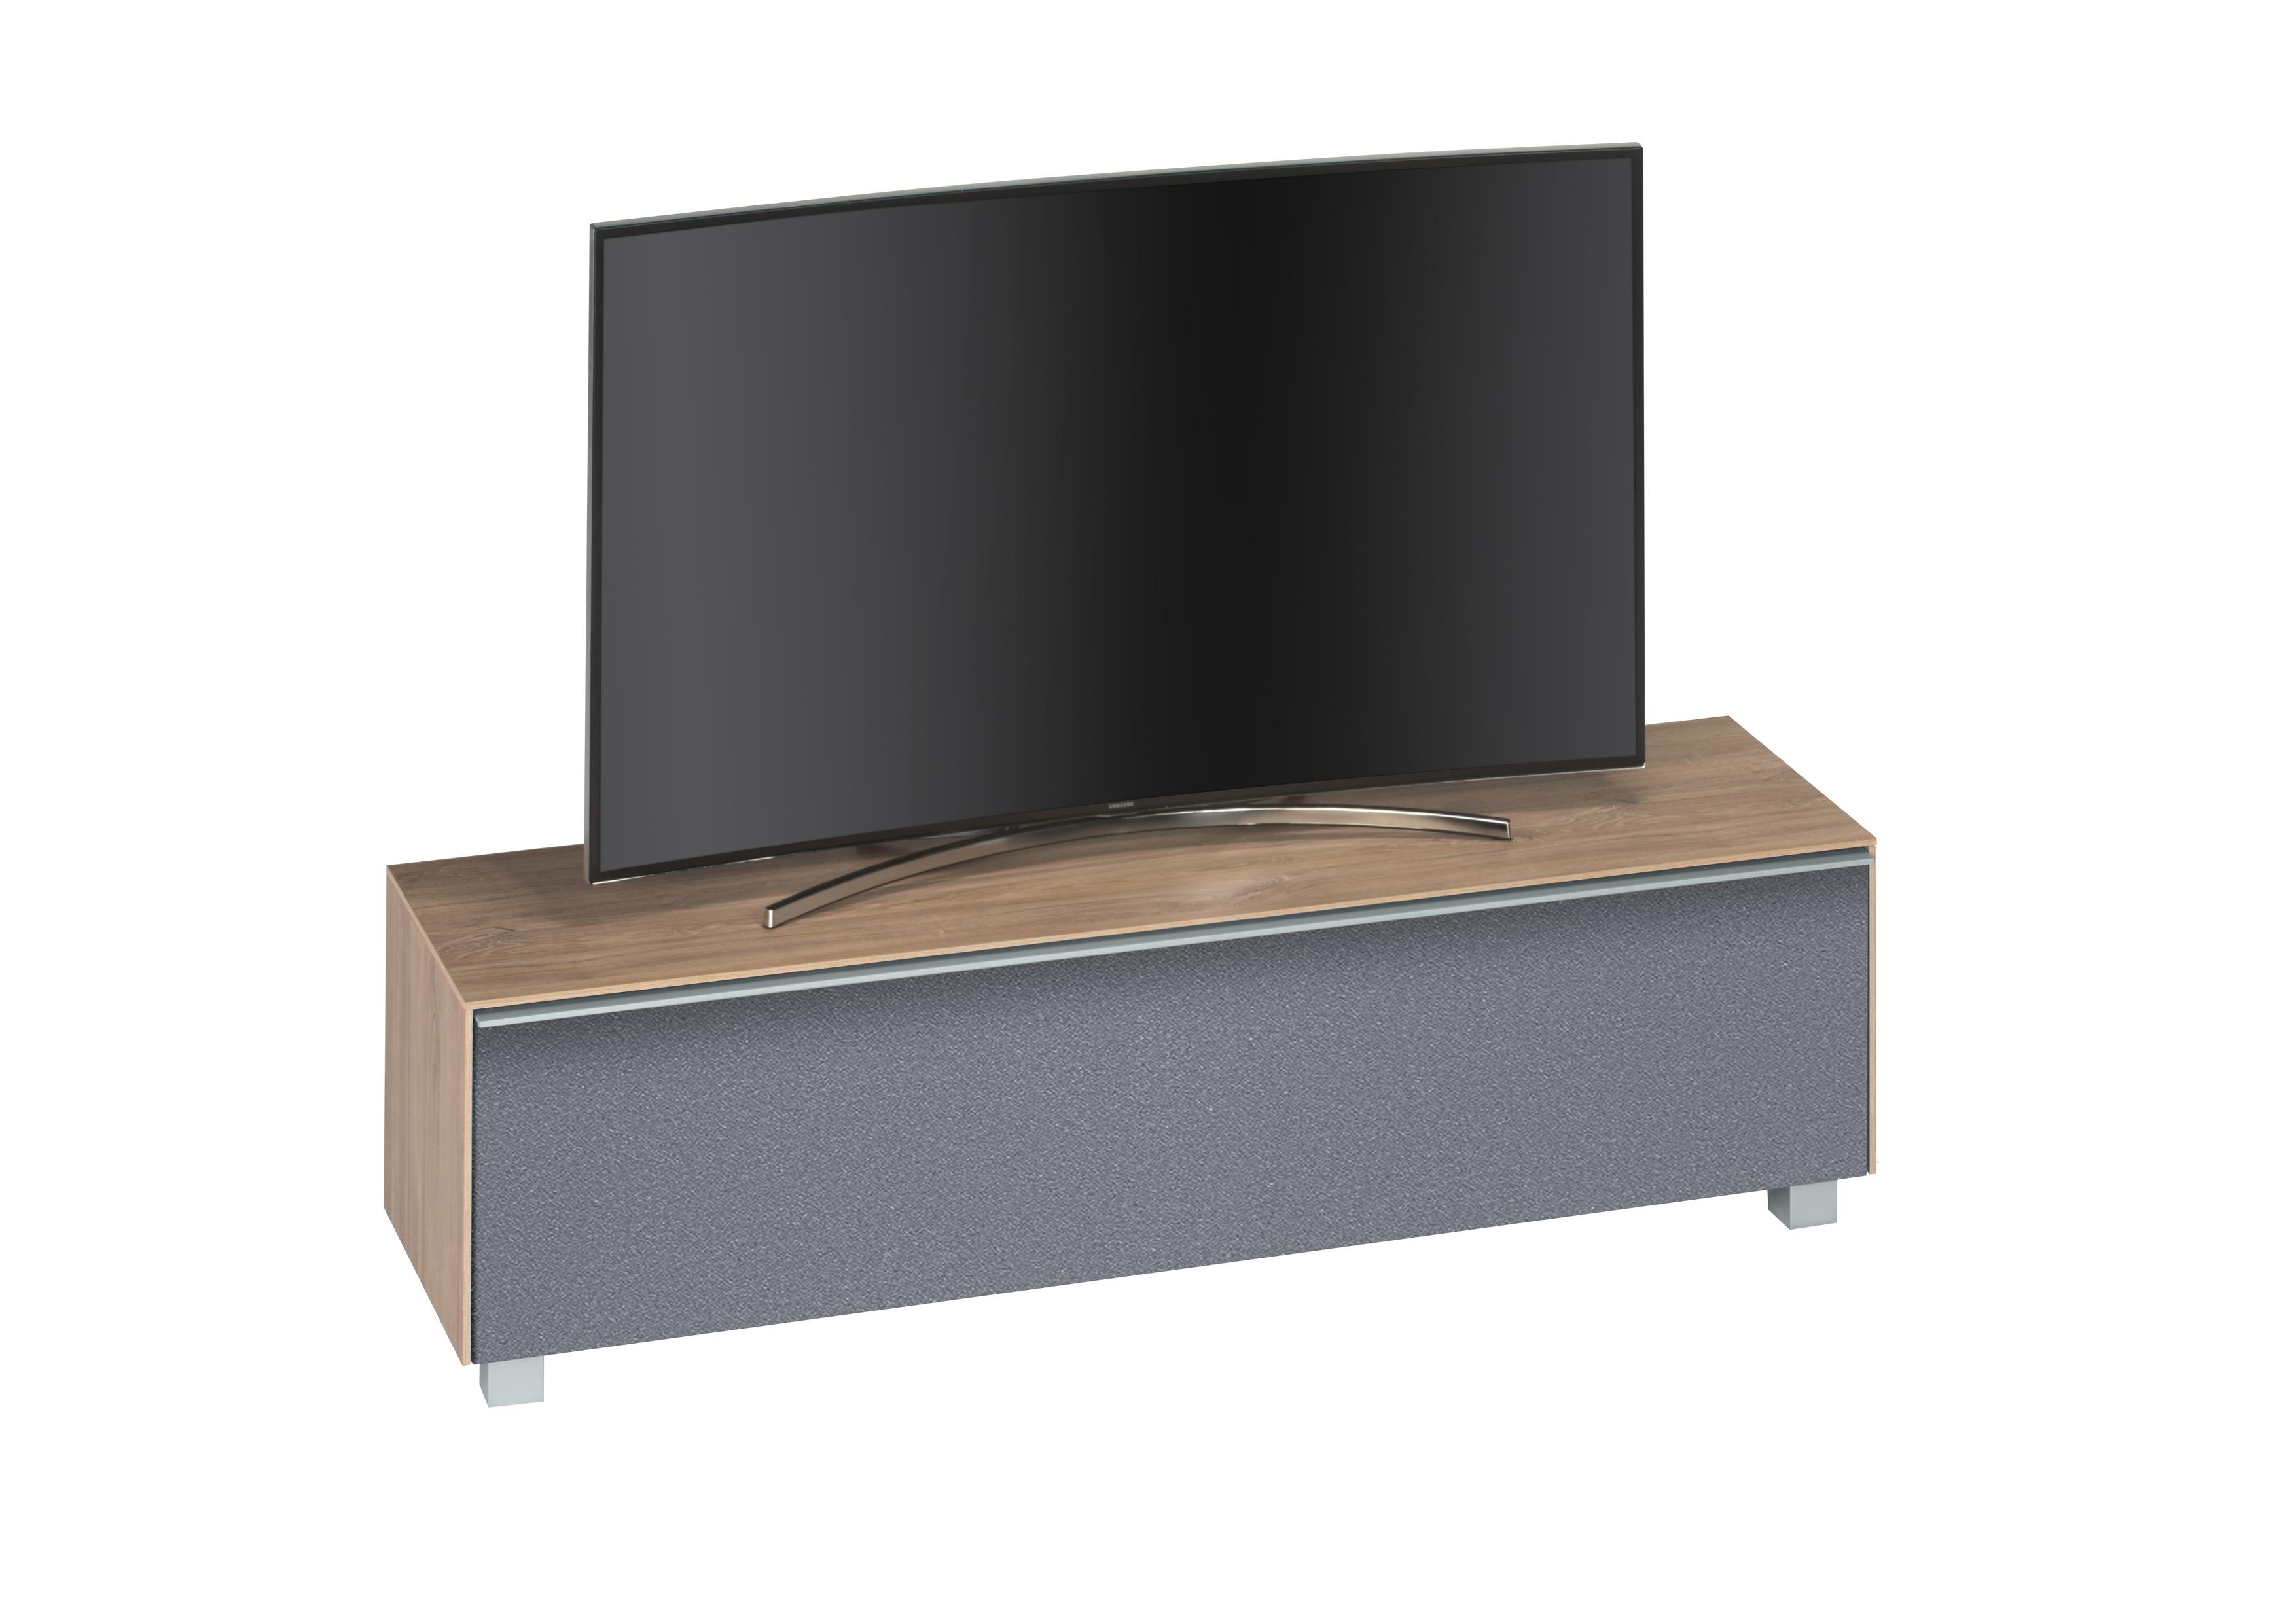 lowboard 160 cm breit soundconcept wood von maja riviera eiche grau. Black Bedroom Furniture Sets. Home Design Ideas